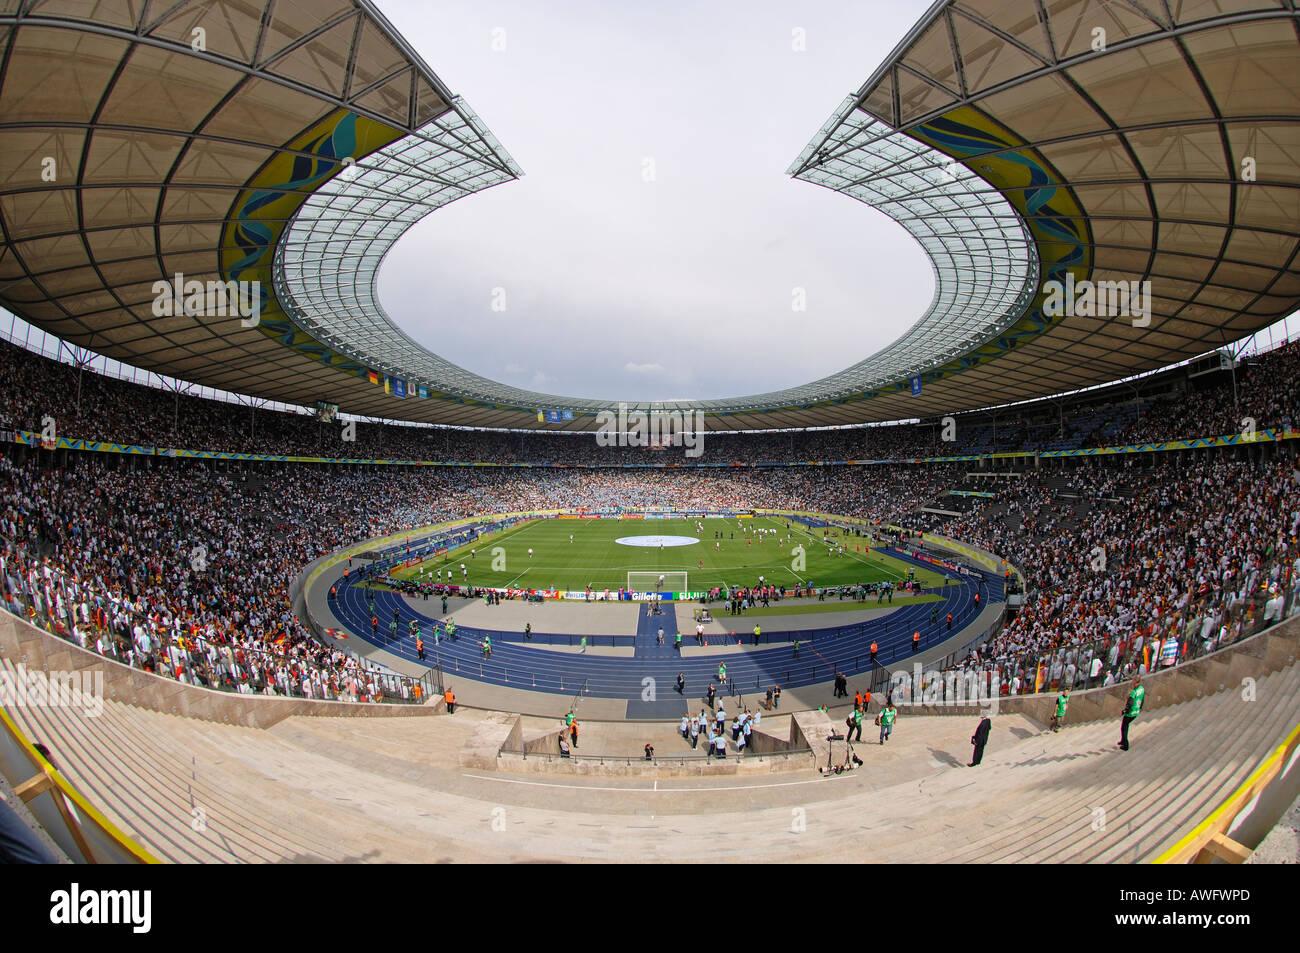 Olympiastadion Berlin, Germany - Stock Image